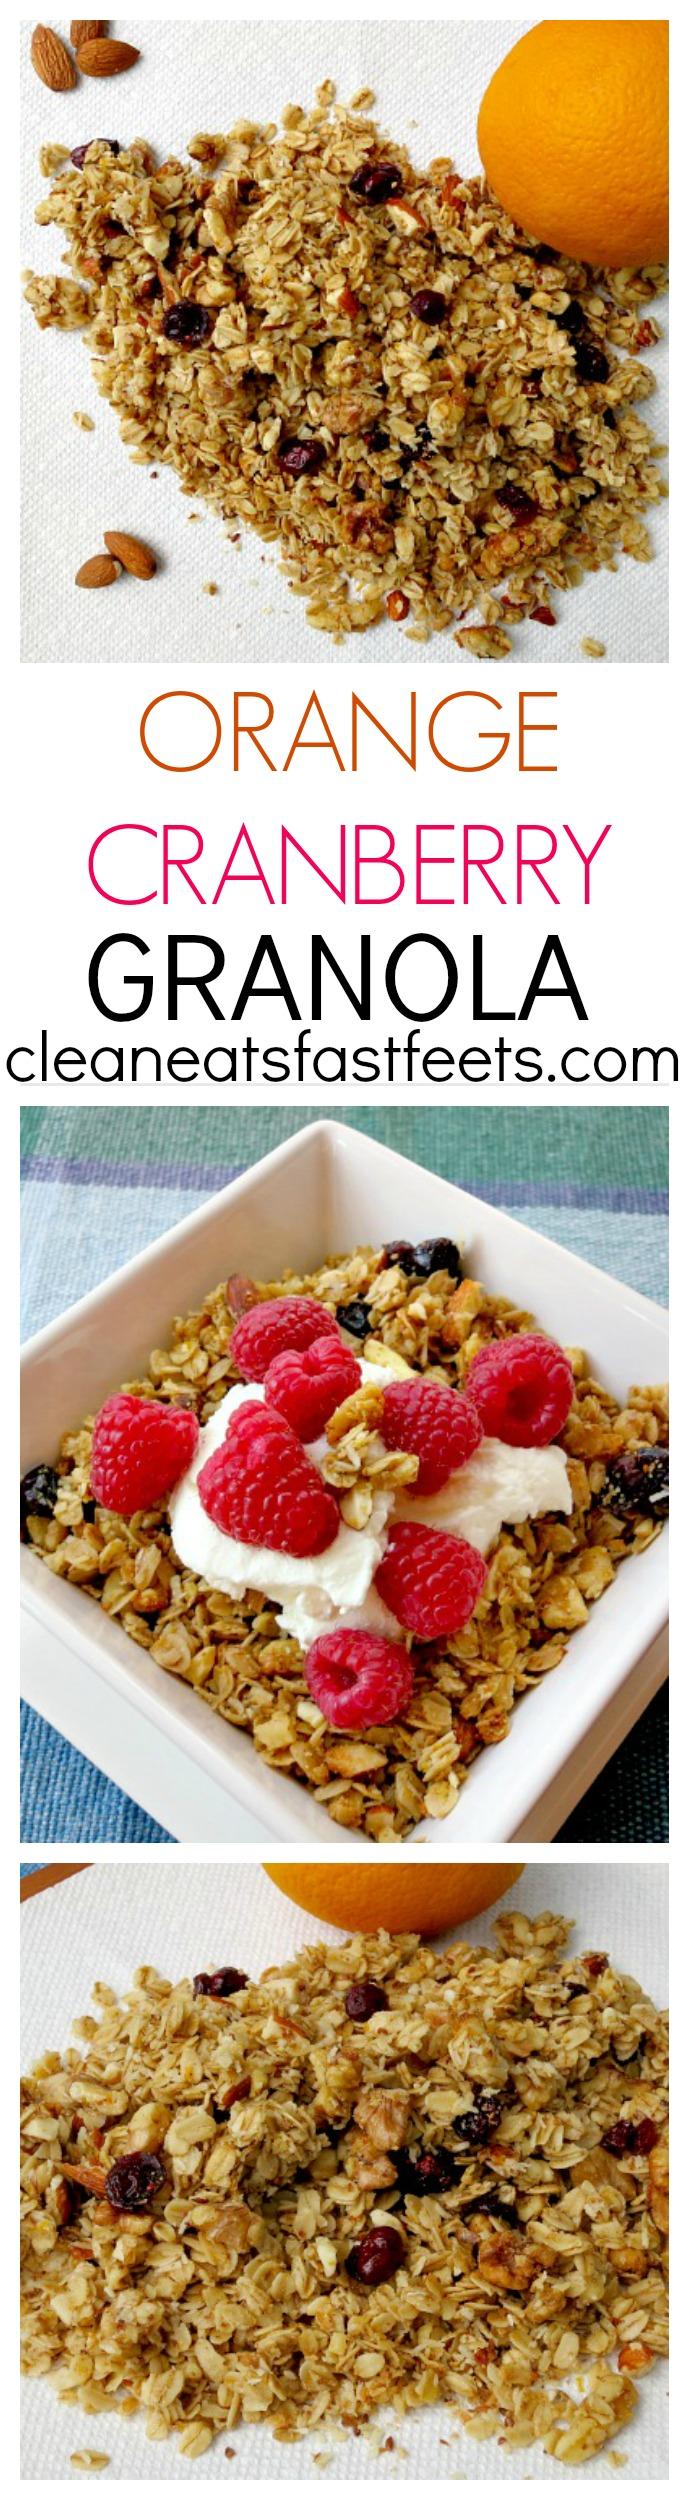 Orange Cranberry Granola. A sweet granola with a burst of citrus flavor.